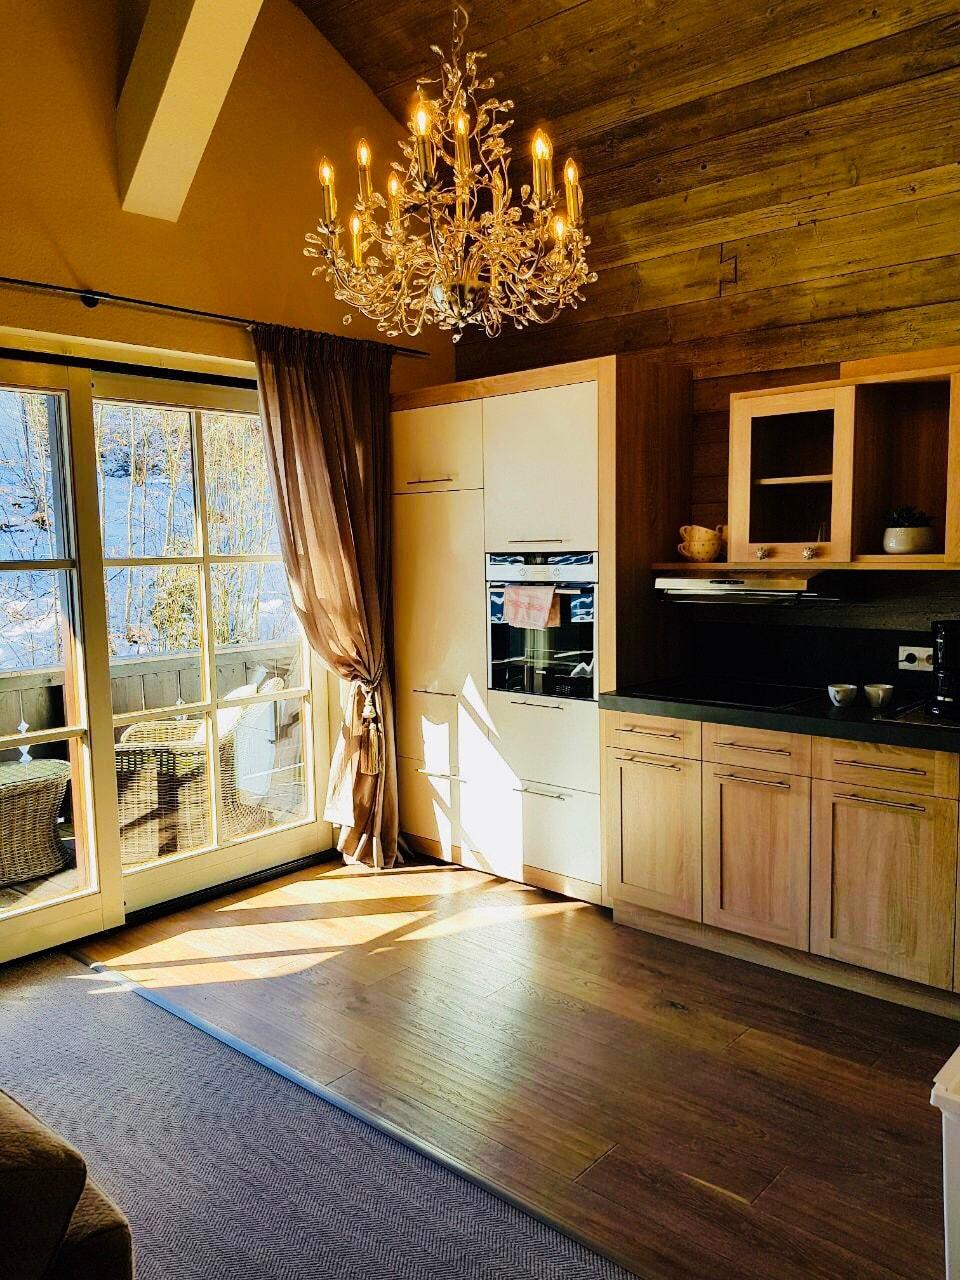 Fesselnd Grainau 2018 (with Photos): Top 20 Grainau Vacation Rentals, Vacation Homes  U0026 Condo Rentals   Airbnb Grainau, Bavaria, Germany